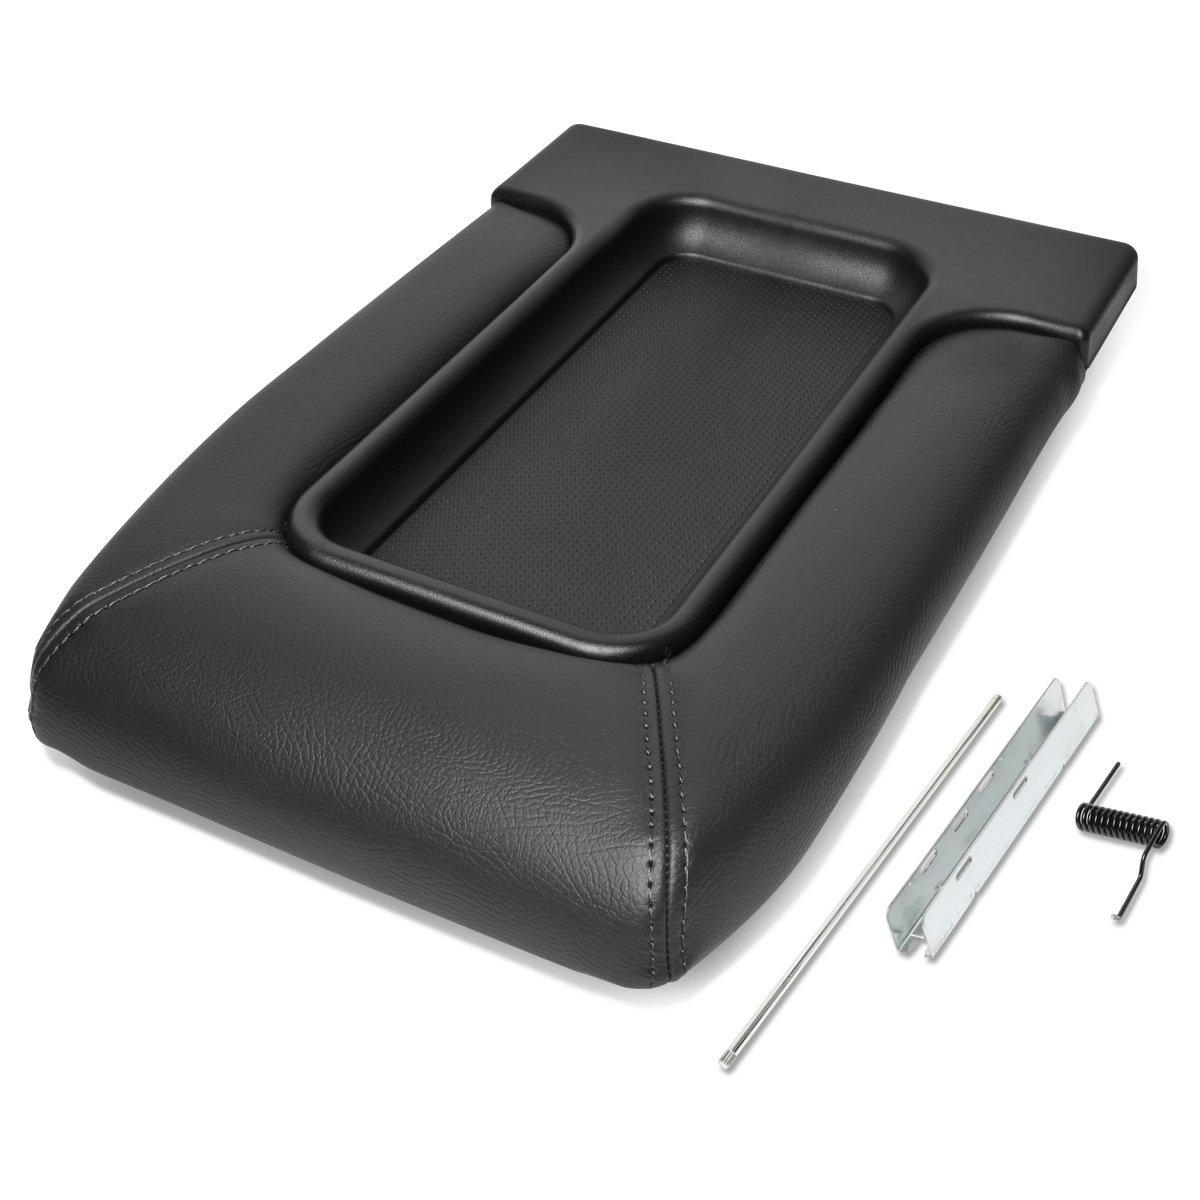 For 01-07 Silverado/Tahoe/Sierra/Yukon XL/Escalade Center Console Tray Lid Repair Kit Arm Rest Latch (Black)